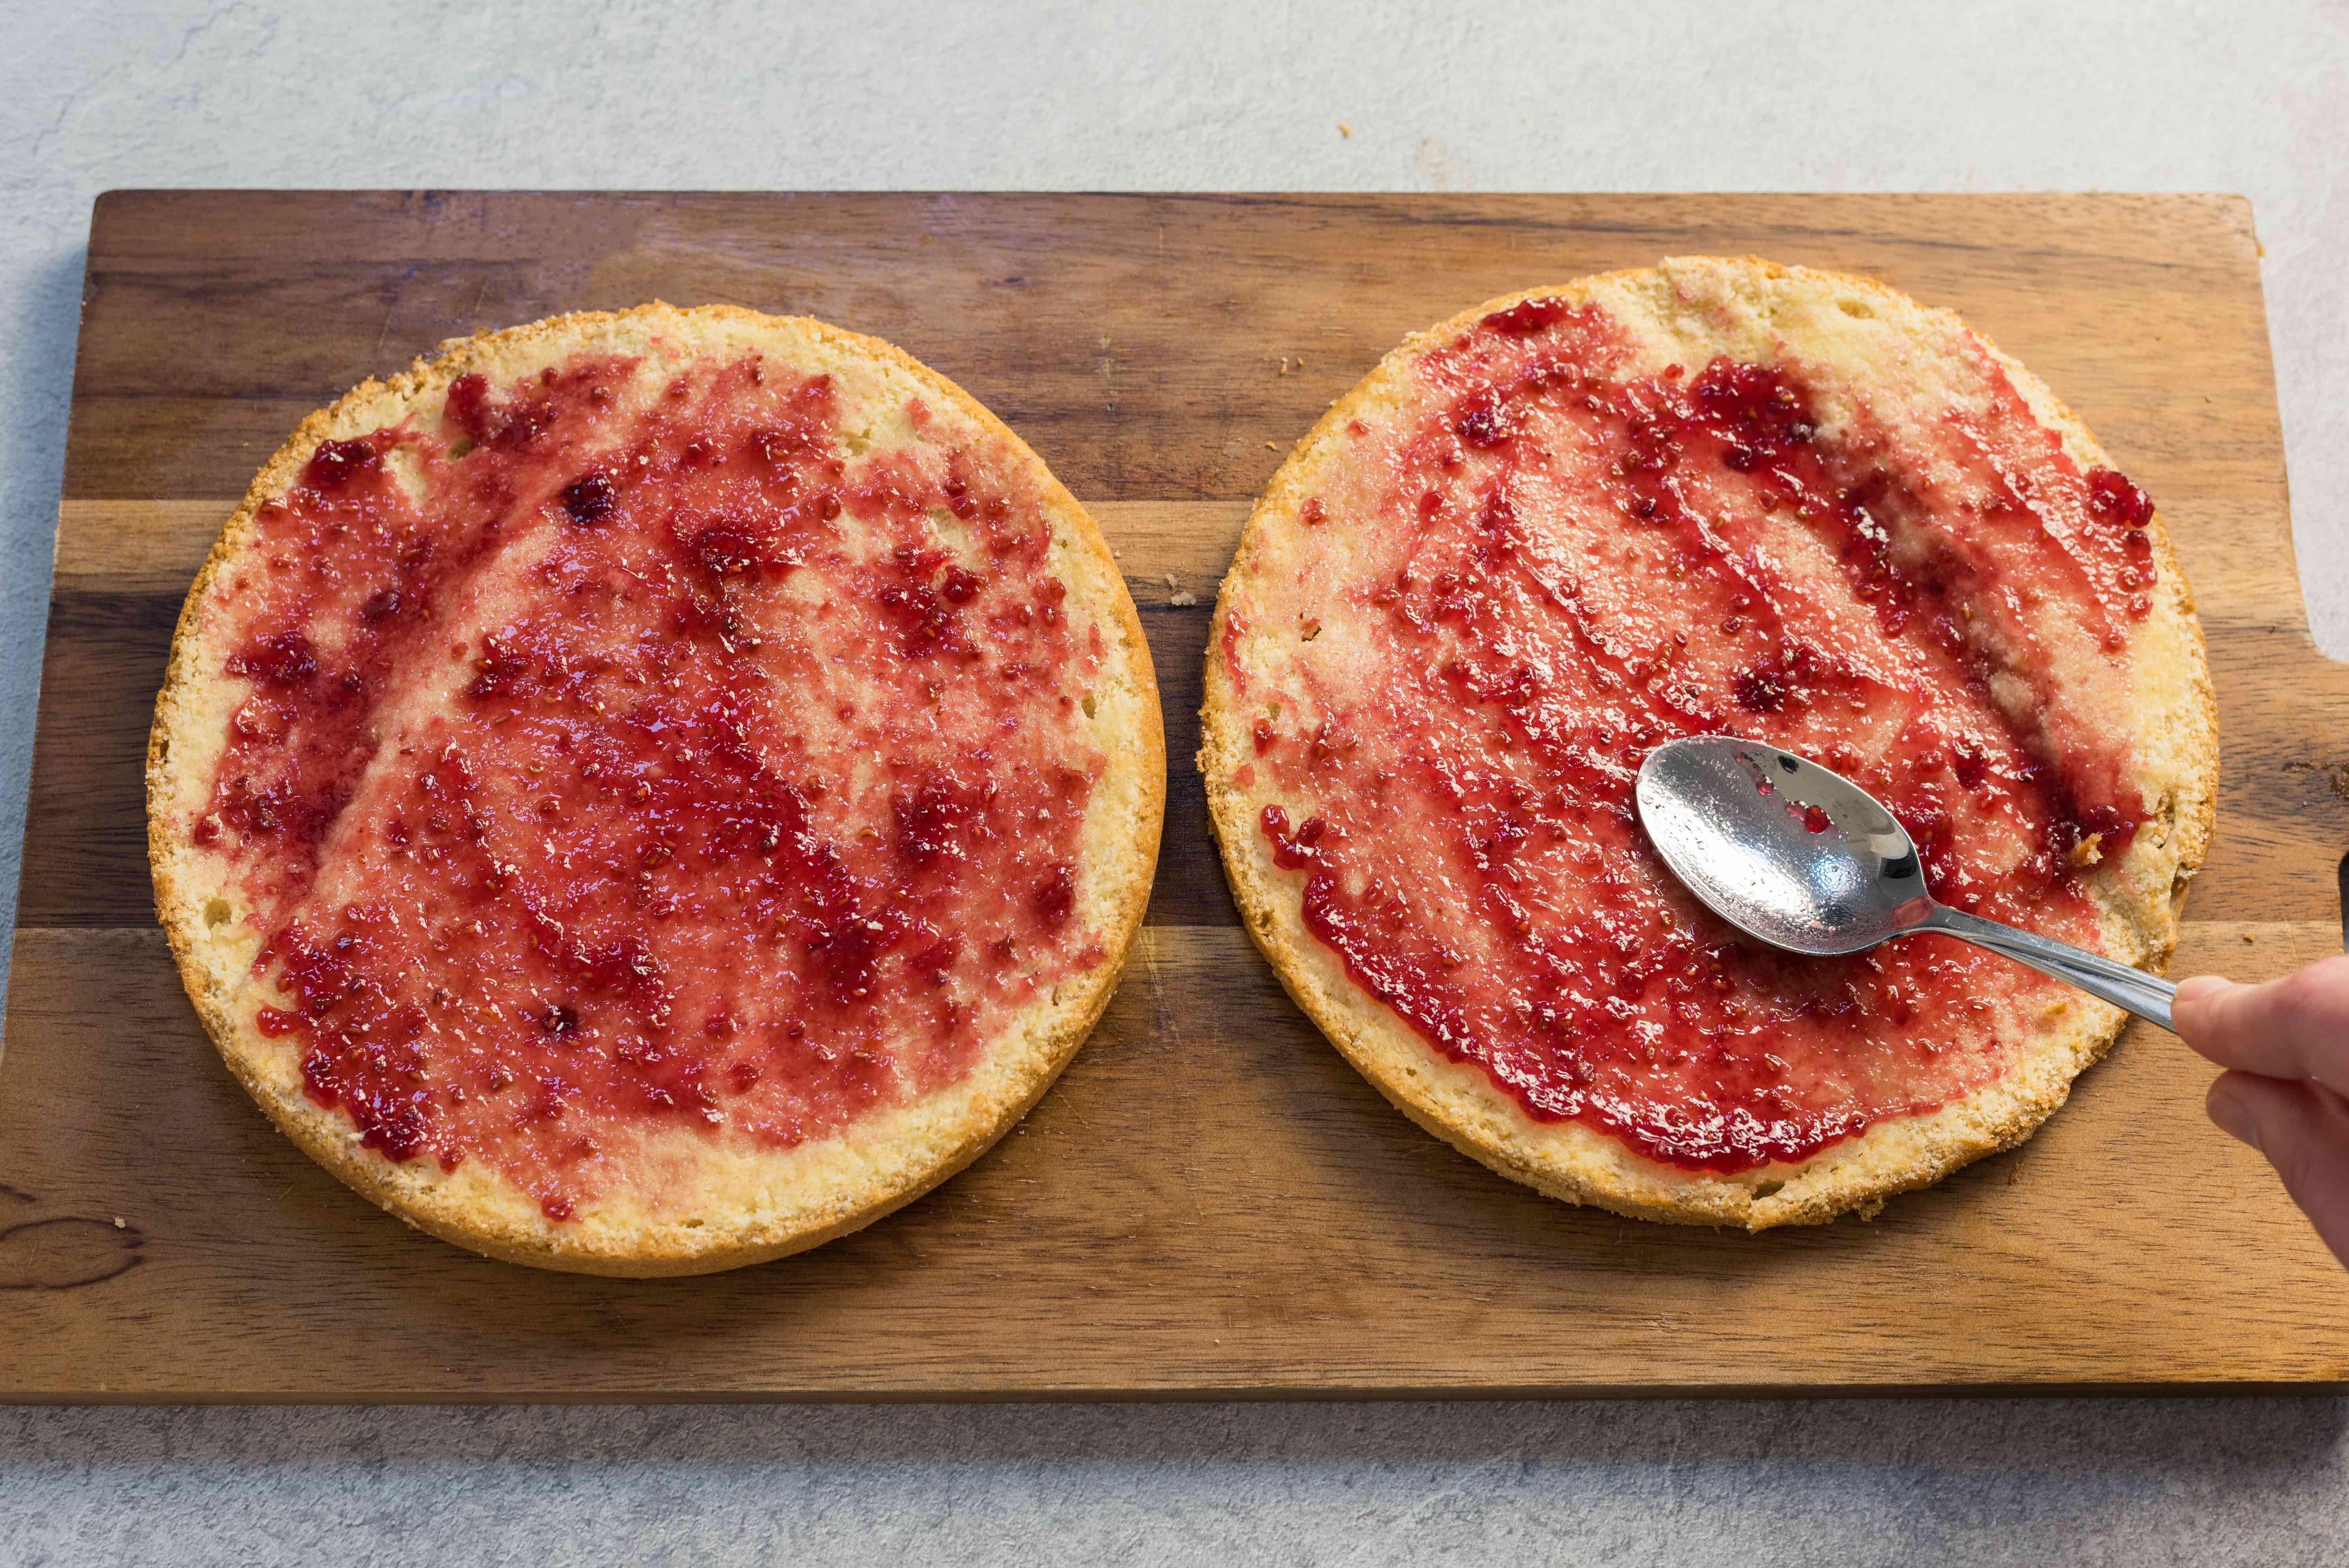 Spread raspberry jam onto cake